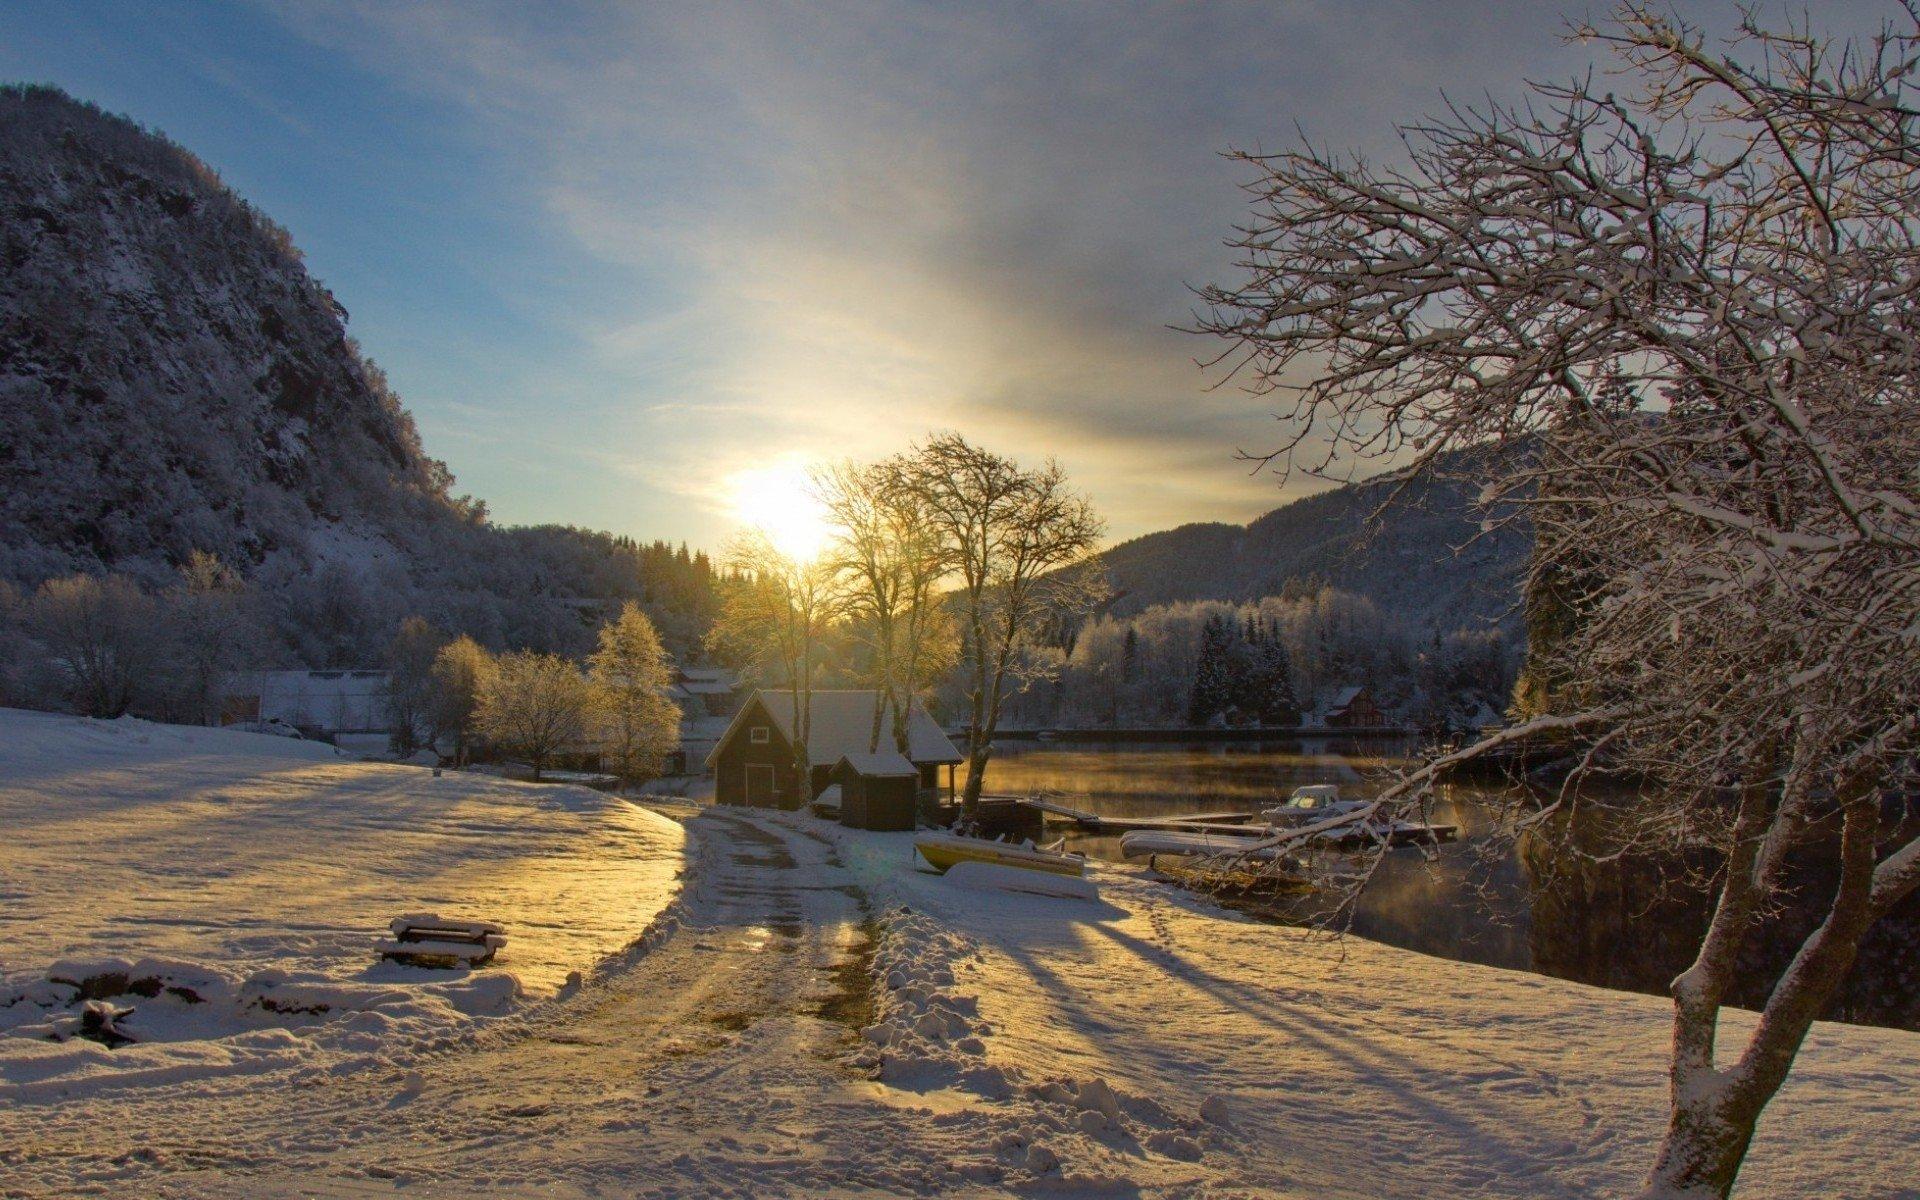 Haus am see wallpaper  Winter Full HD Wallpaper and Hintergrund | 1920x1200 | ID:545527